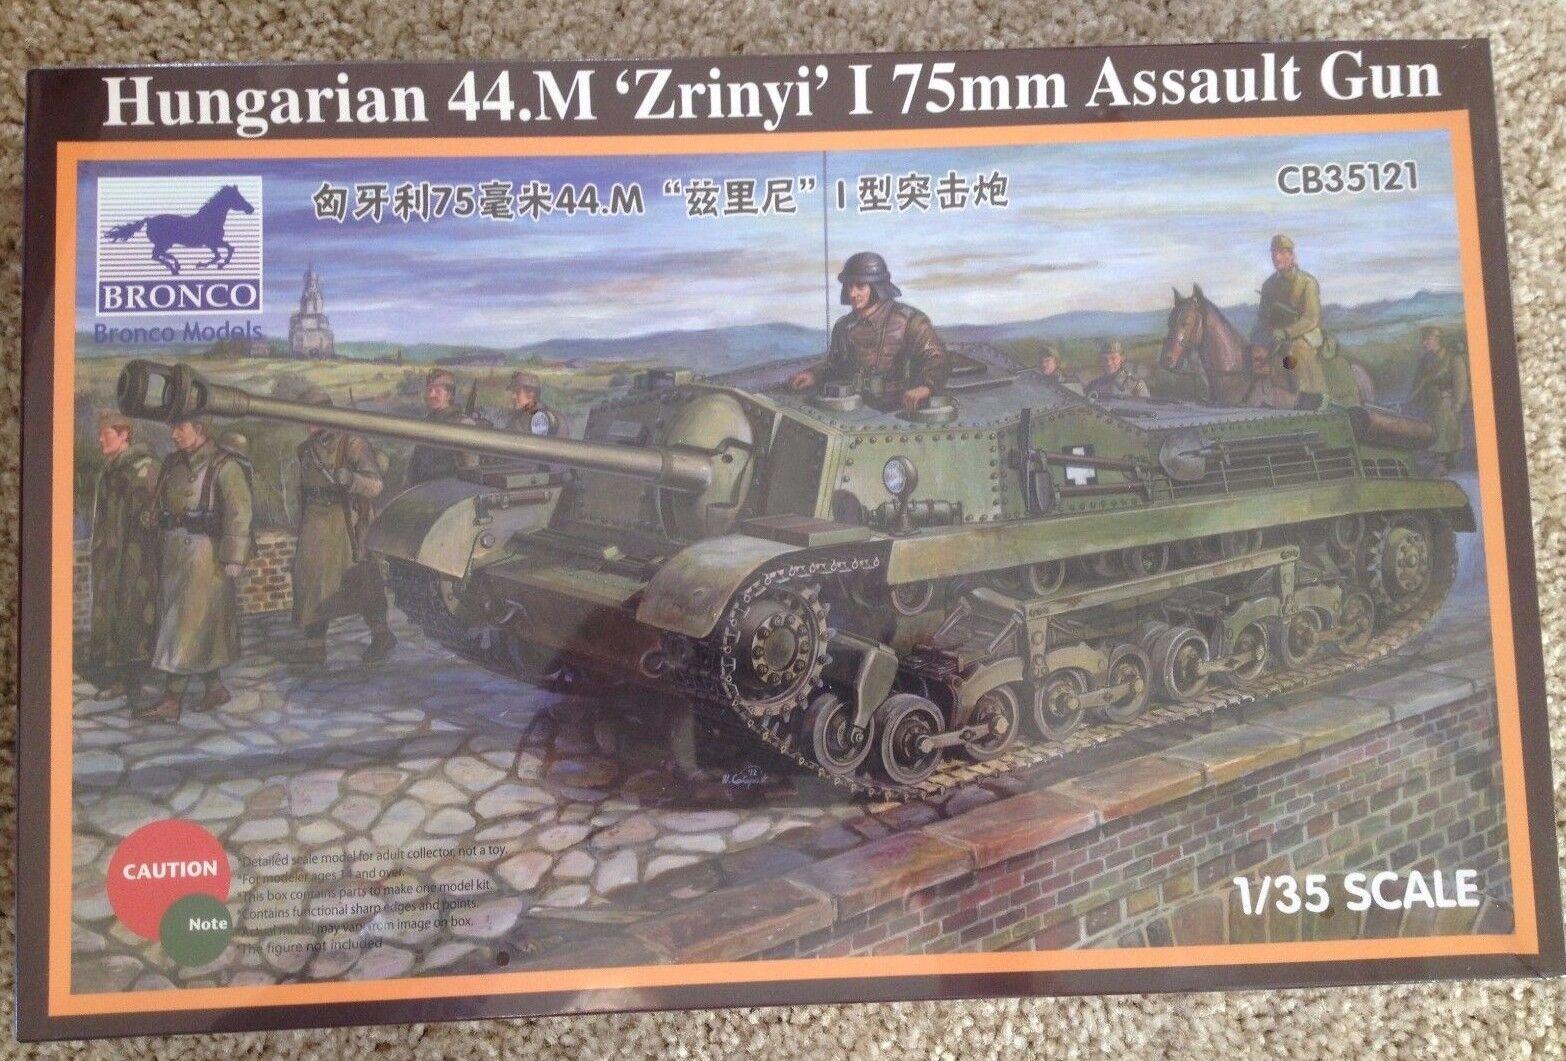 1 35 Hungarian 44.M Zrinyi I 75mm Assault Gun - Bronco